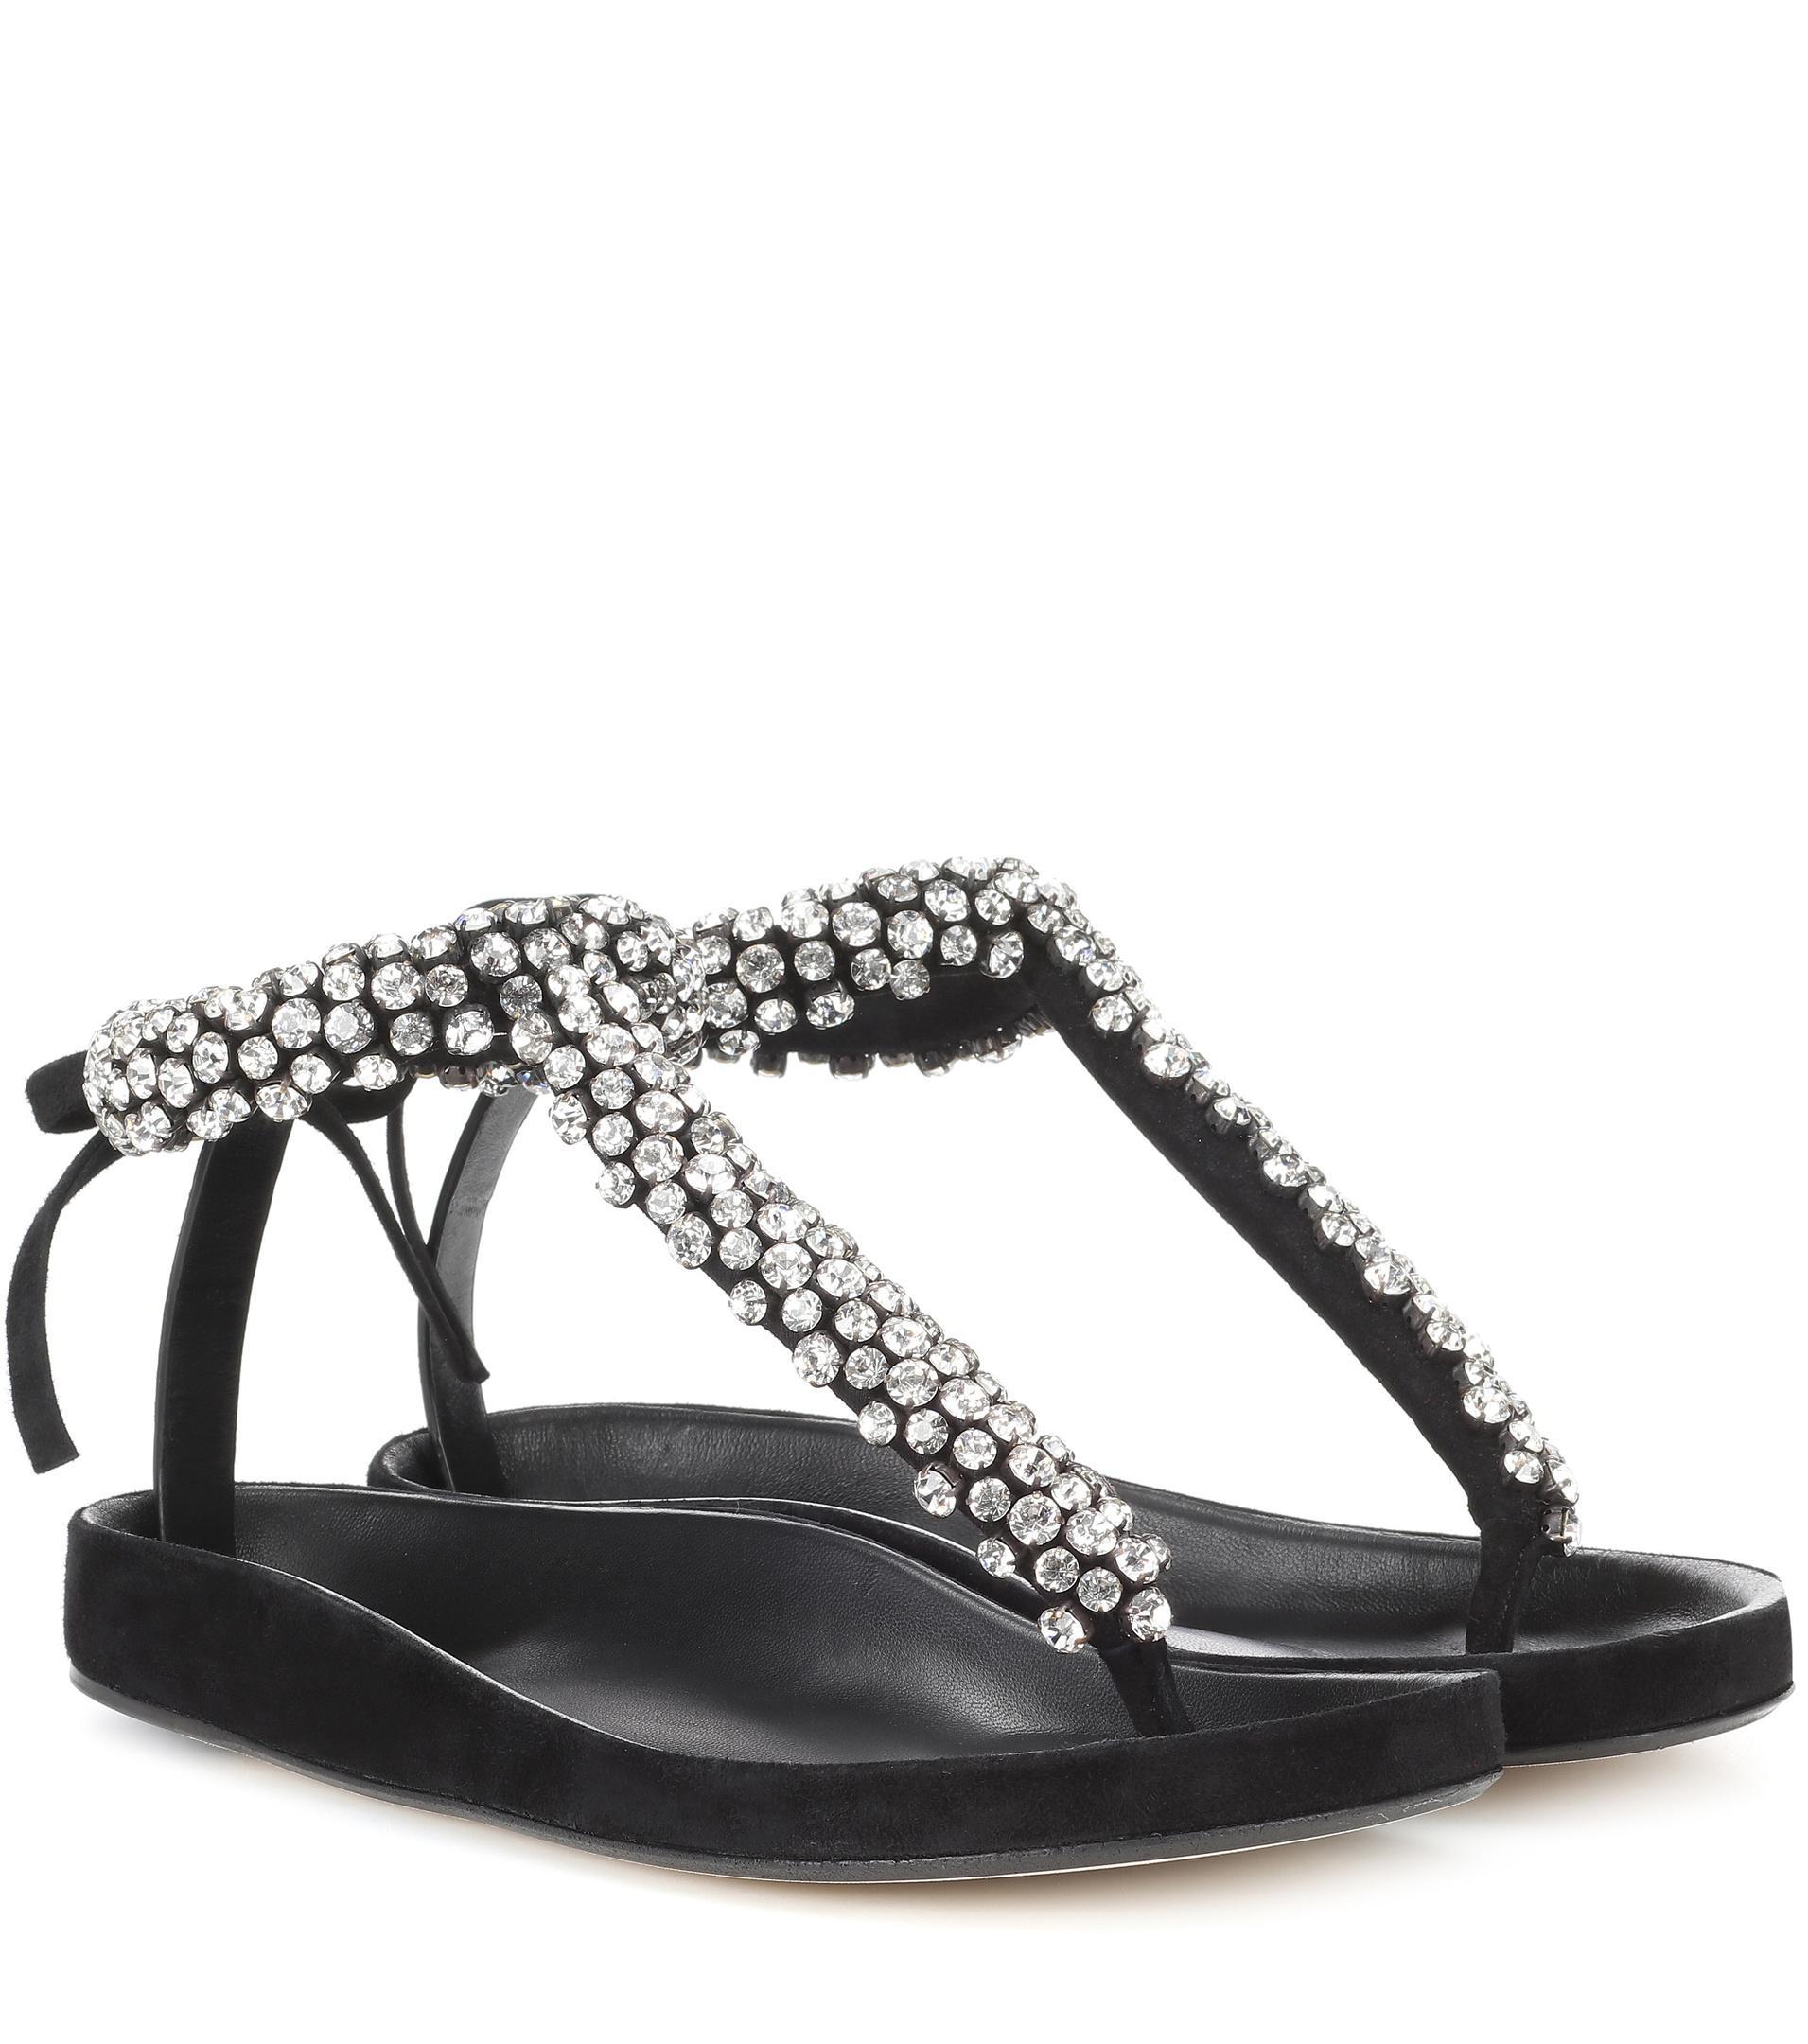 Isabel Marant Emita embellished leather sandals